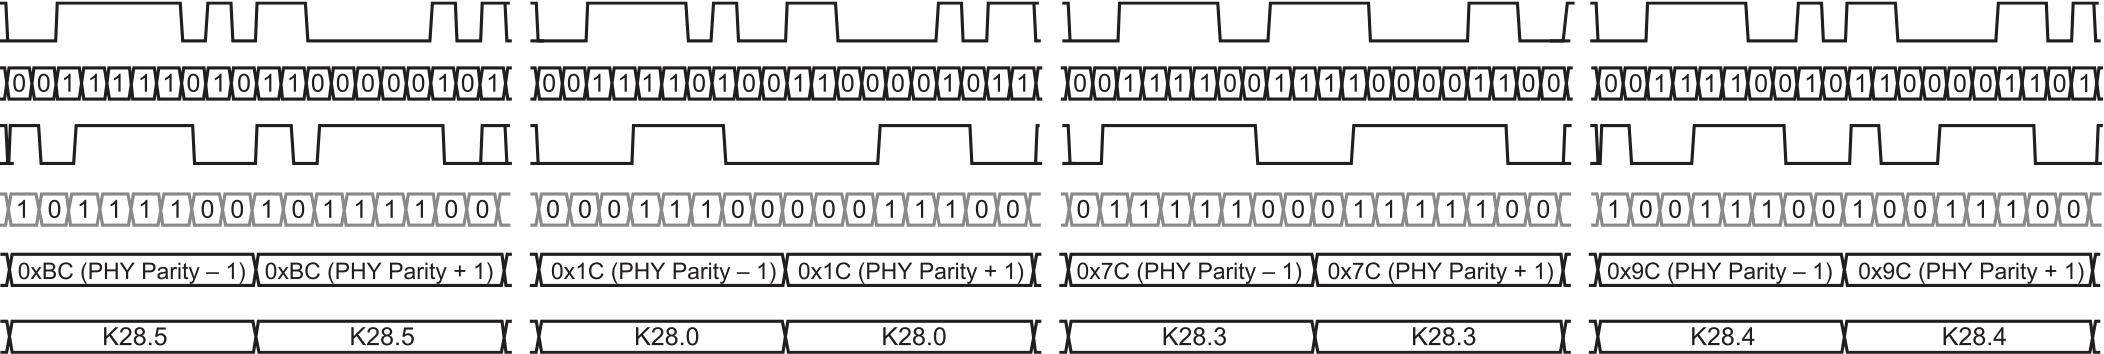 K28.5 — символ /К/; б) K28.0 — символ /R/; в) K28.3 — символ /A/; г) K28. — символ /К/